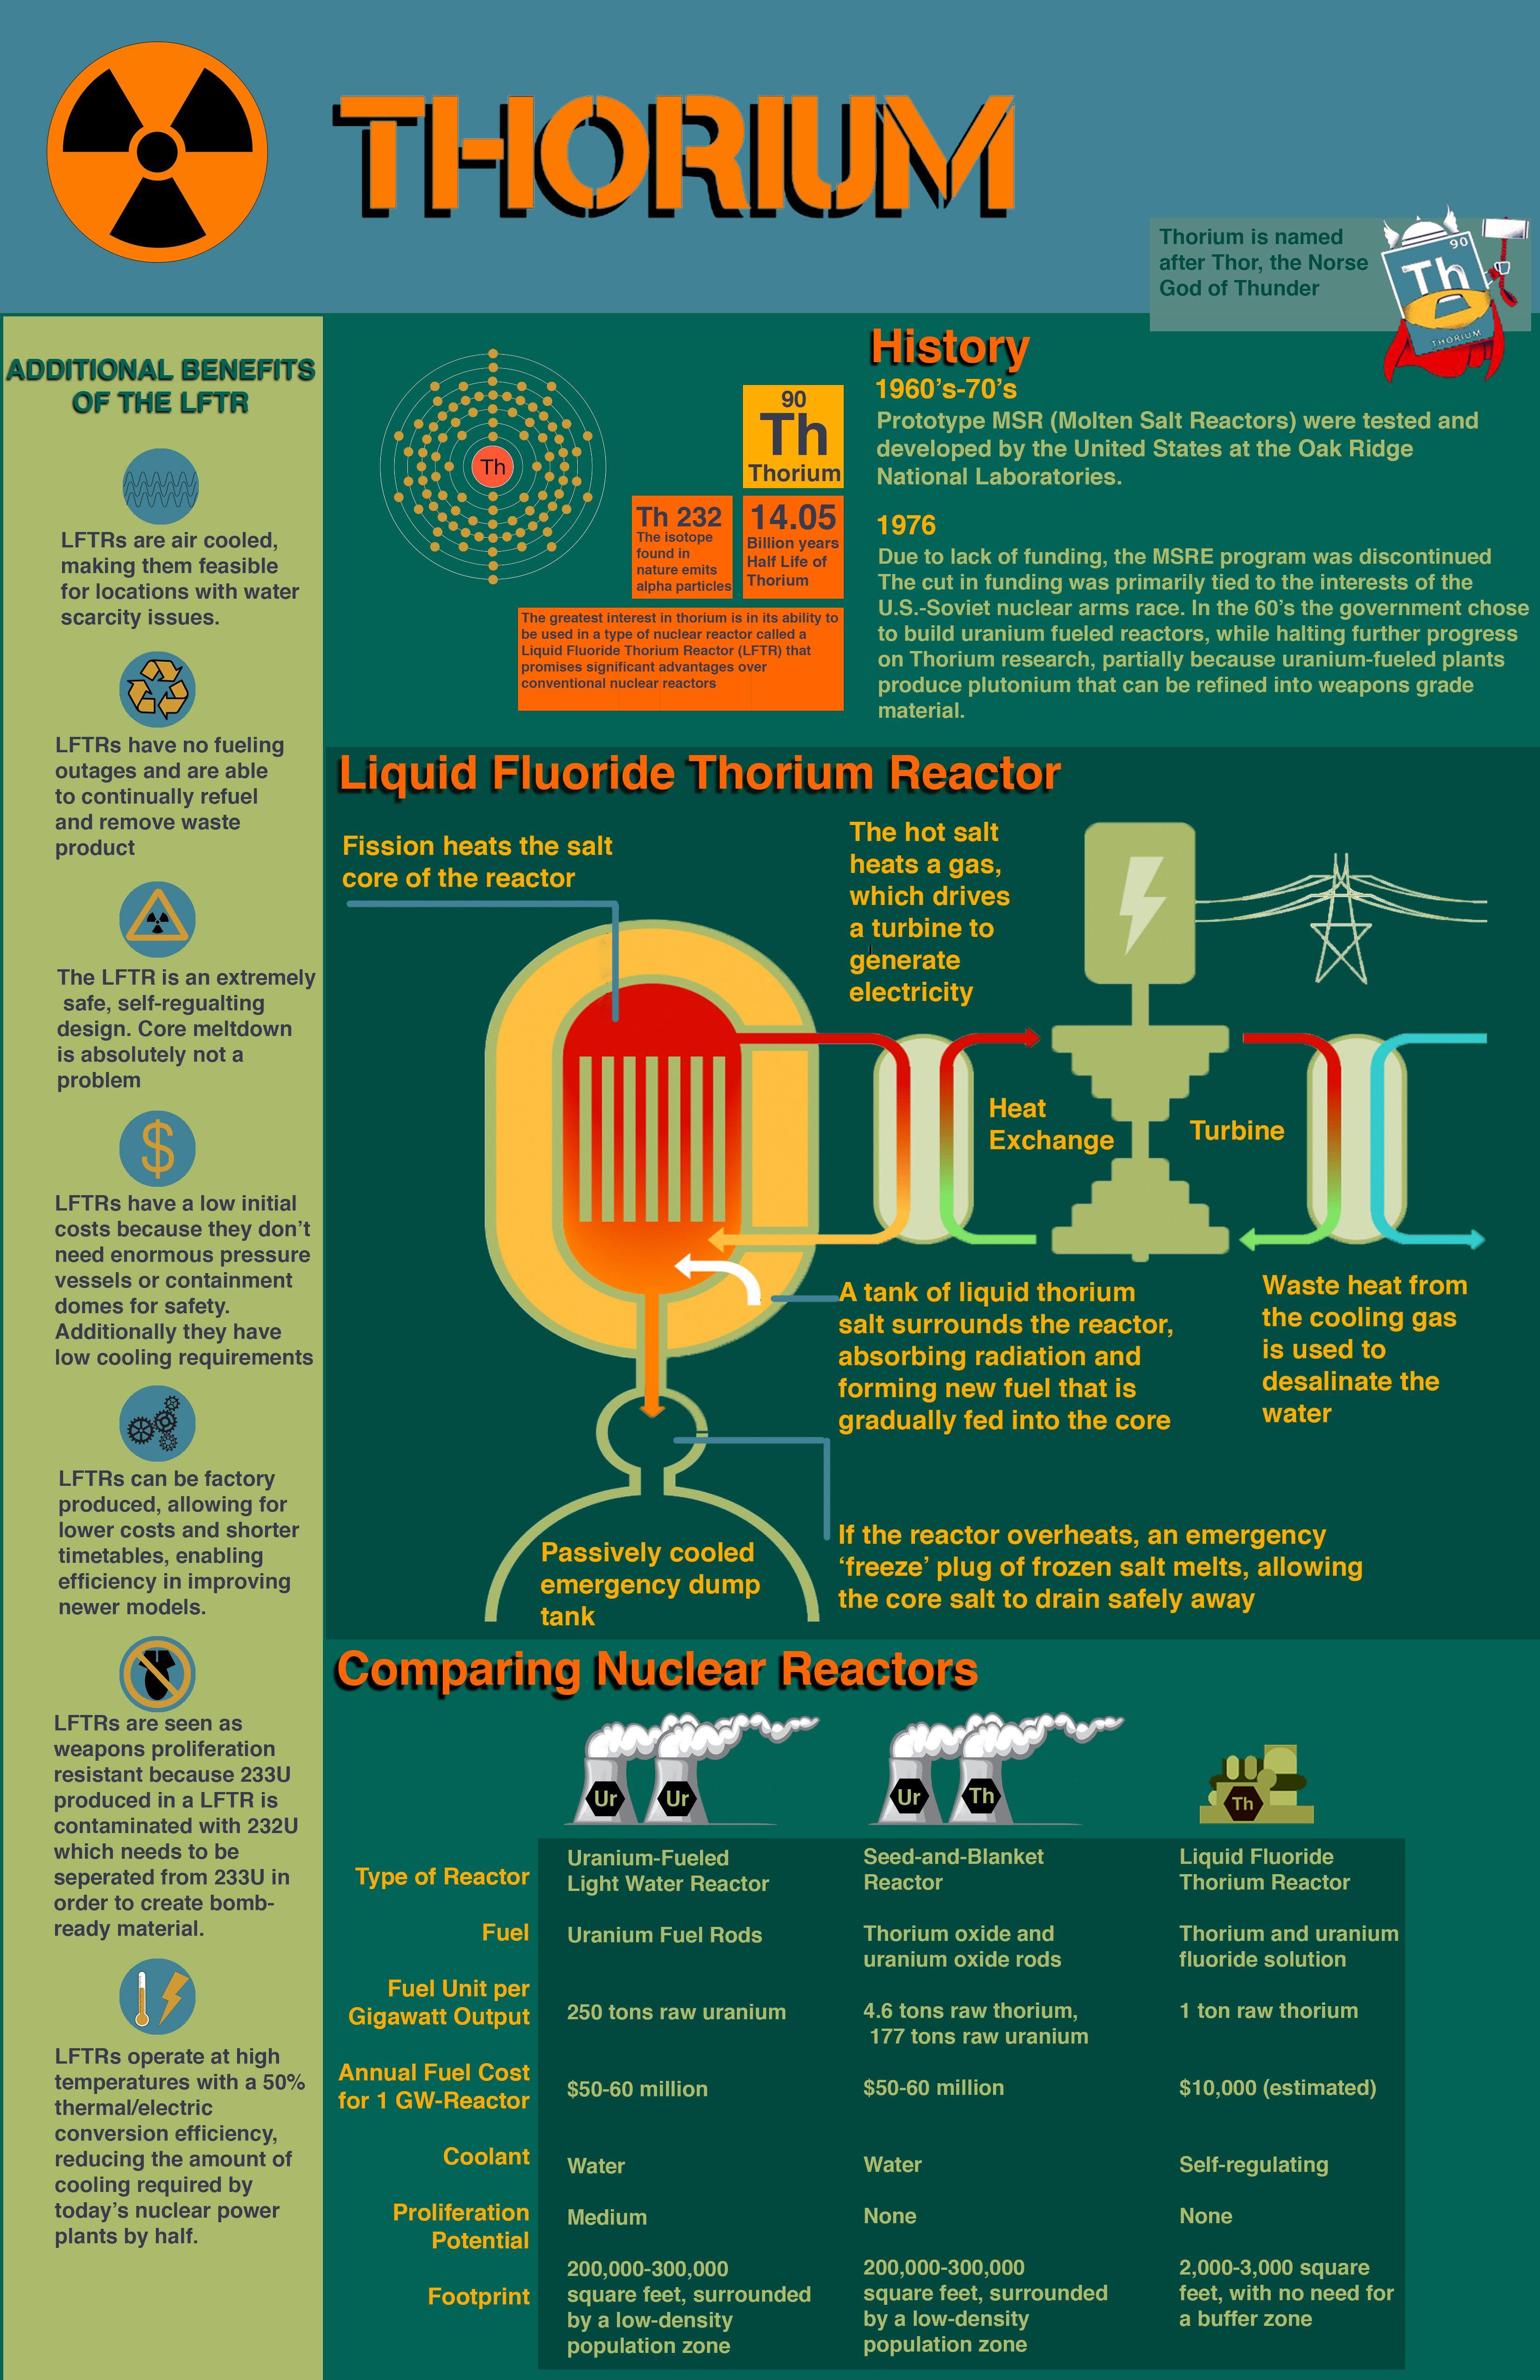 Thorium-based nuclear power